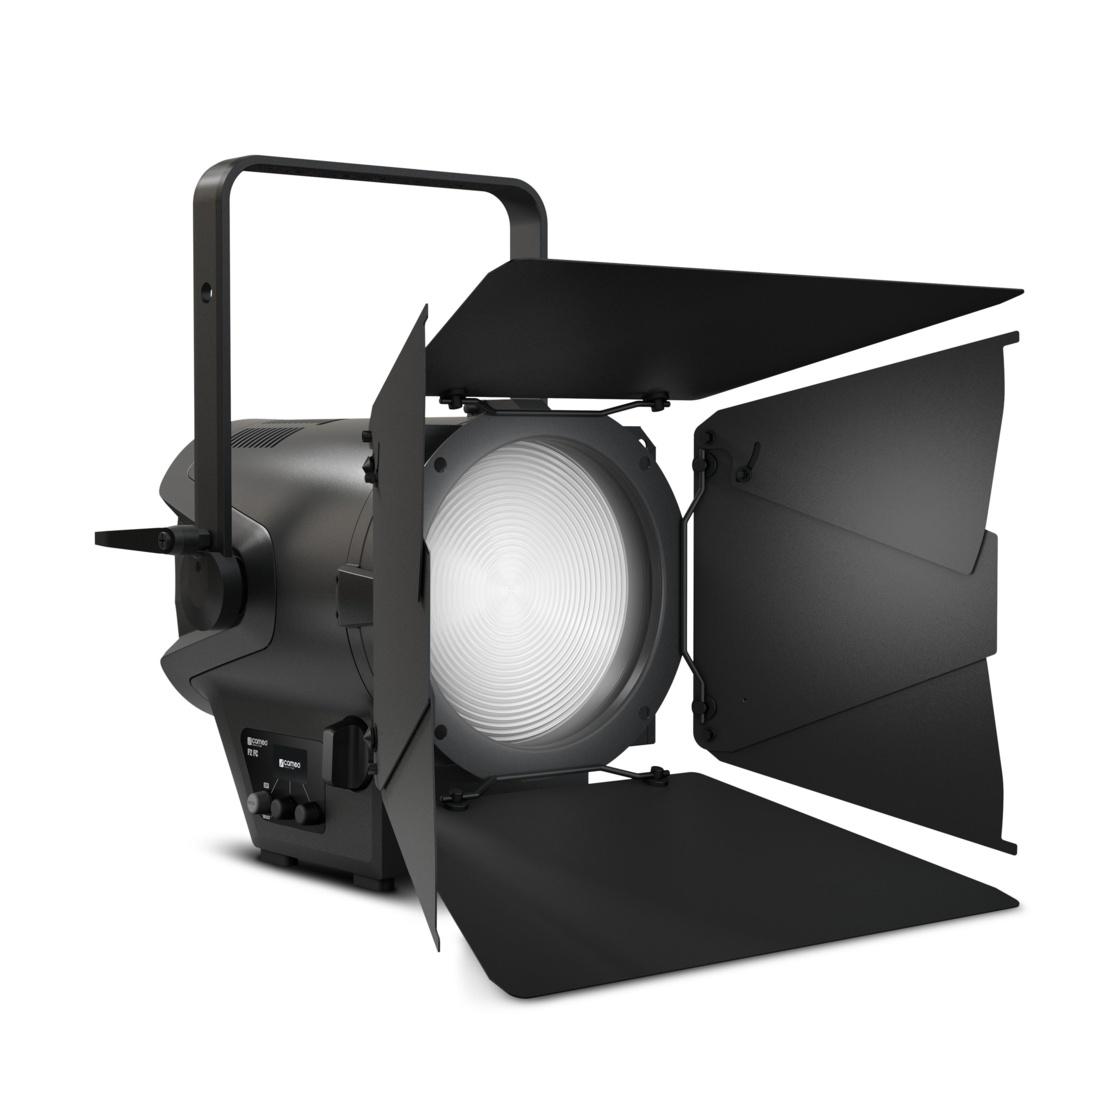 Foco profesional Fresnel con LED RGBW Cameo F2 FC de Adam Hall